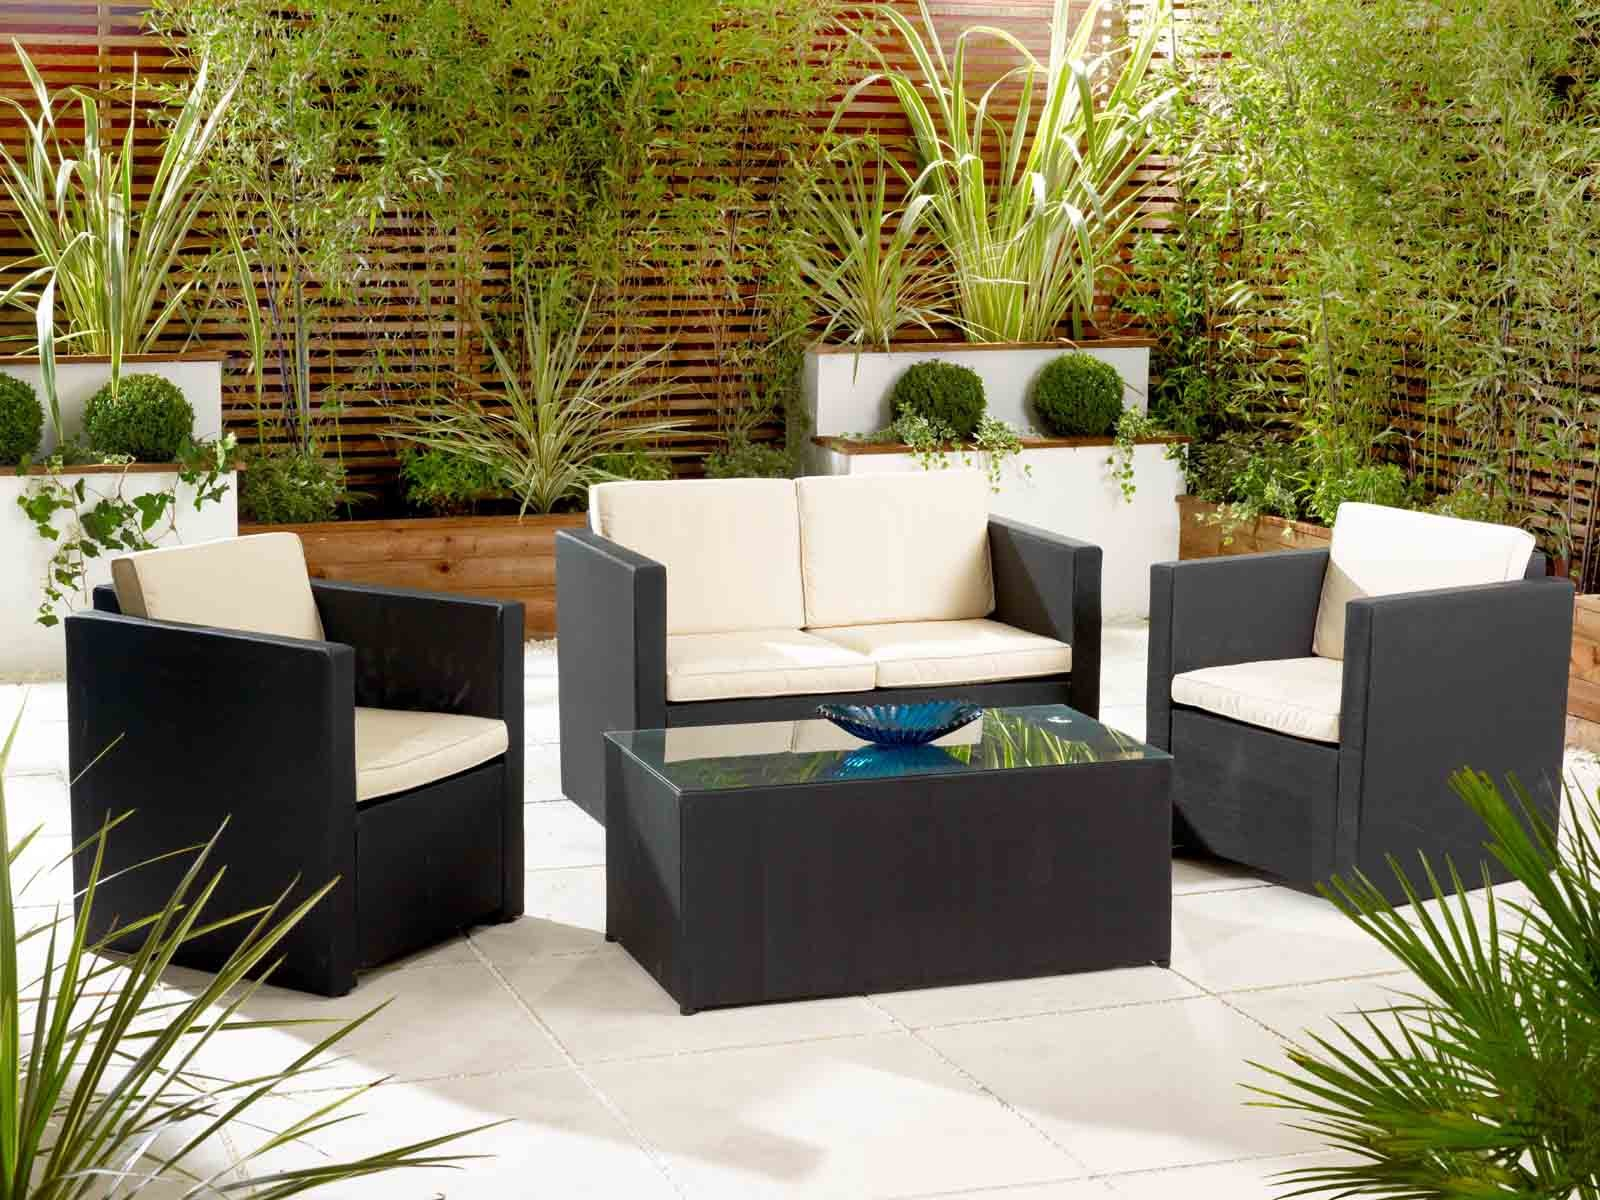 Wallpaper Think Different Quotes 25 Stunning Garden Furniture Inspiration